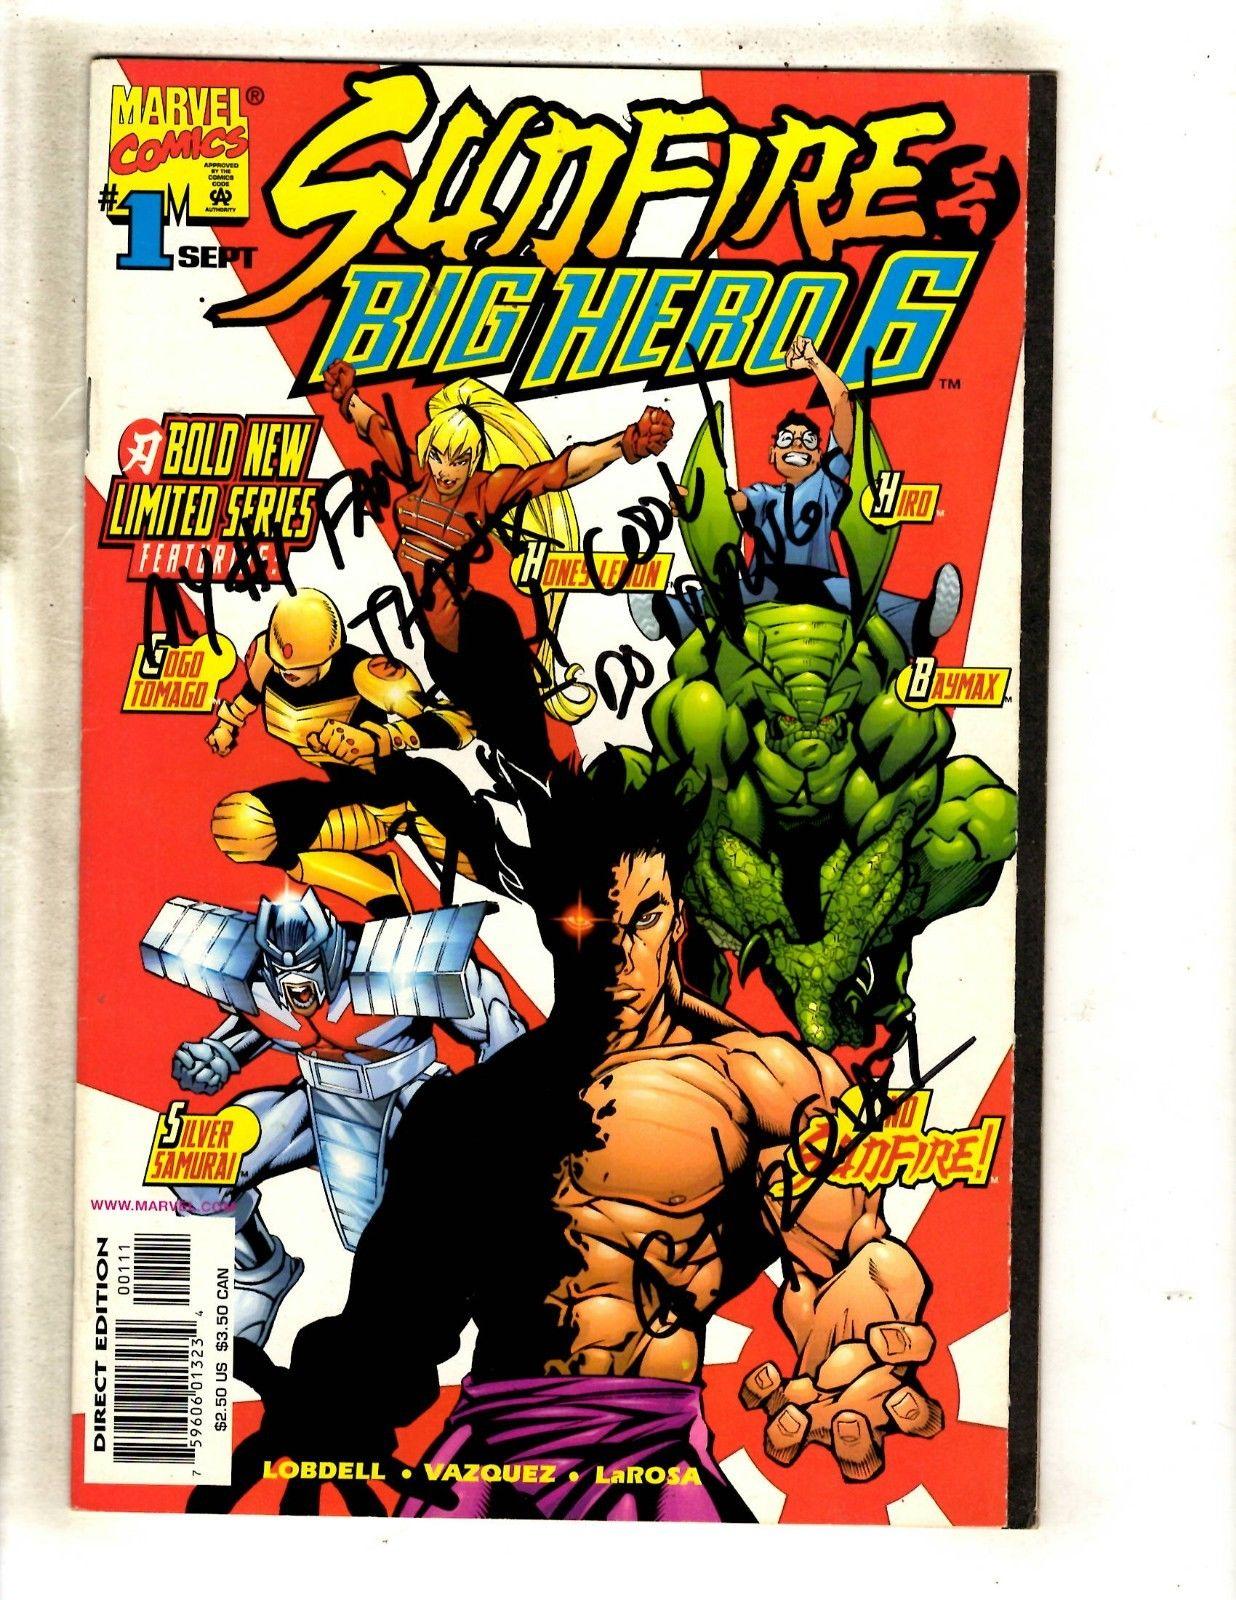 Big Hero Comic sunfire & big hero 6 # 1 nm- signedvazquez marvel comic